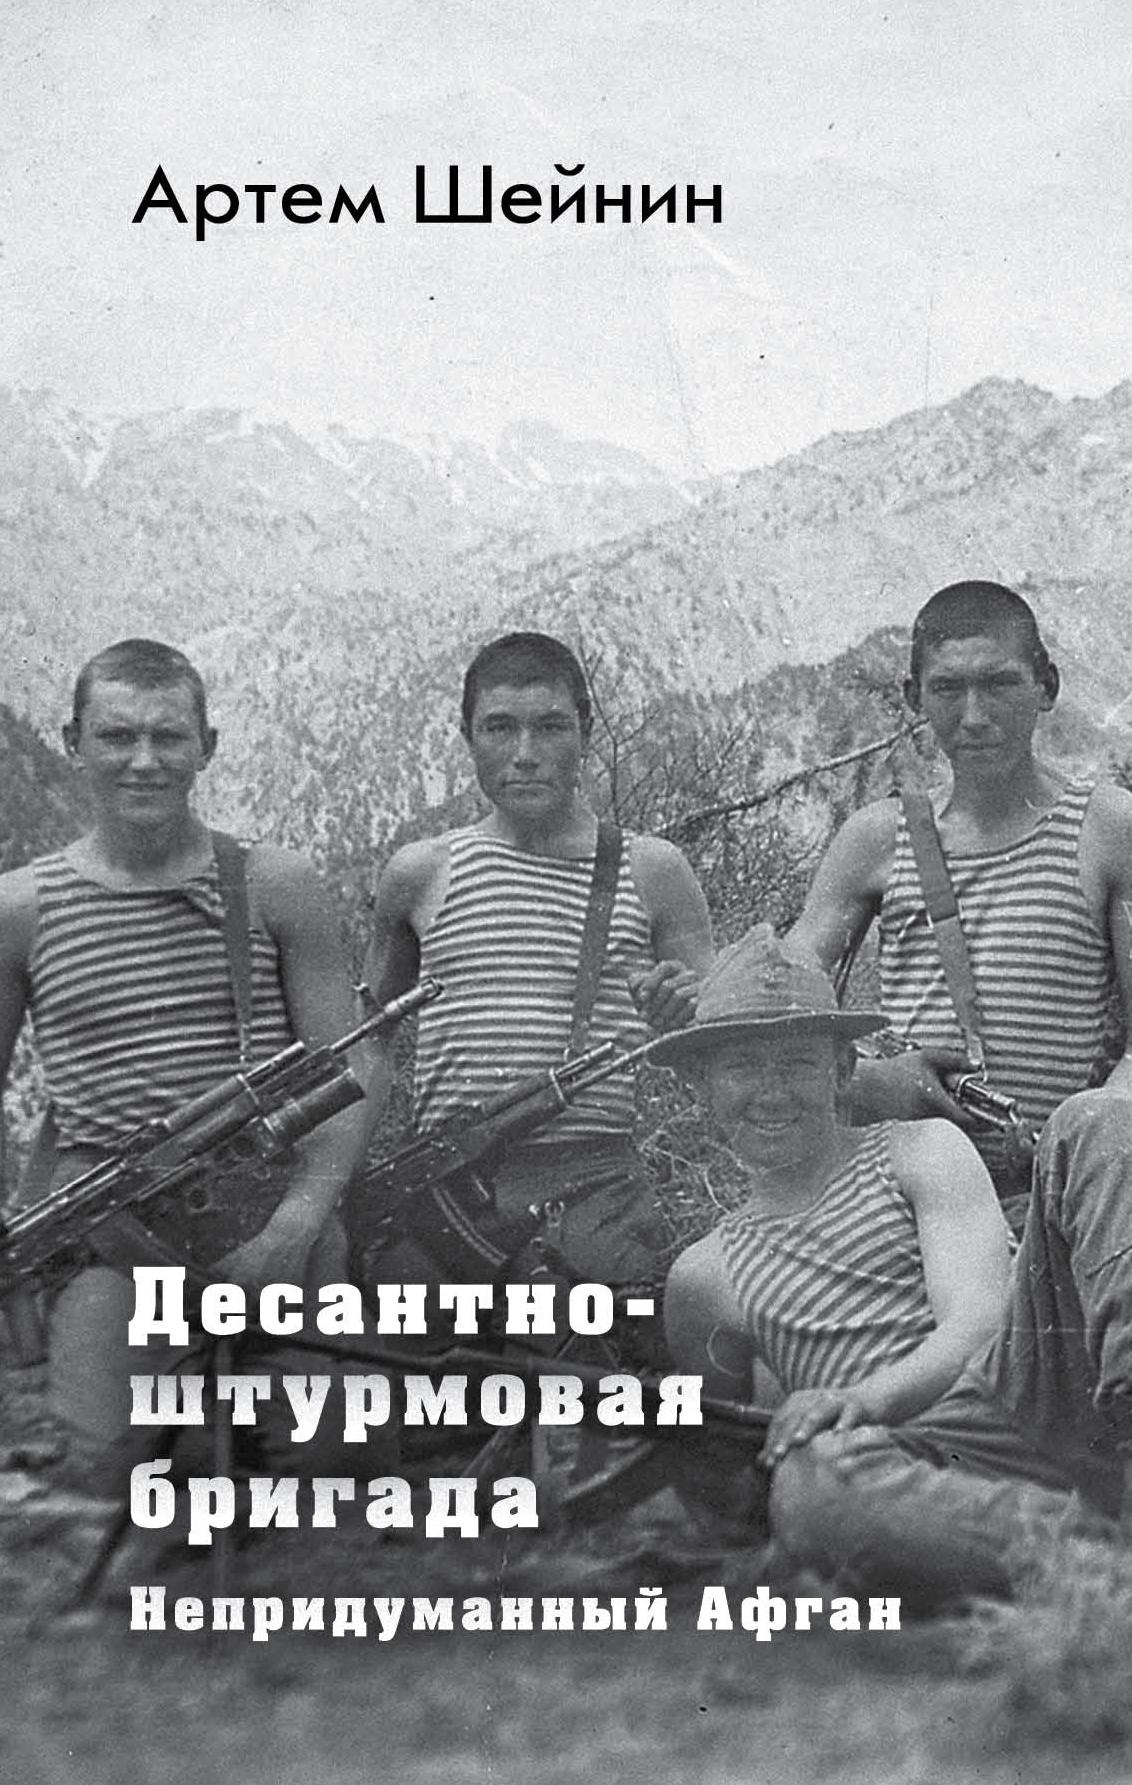 Десантно-штурмовая бригада. Непридуманный Афган